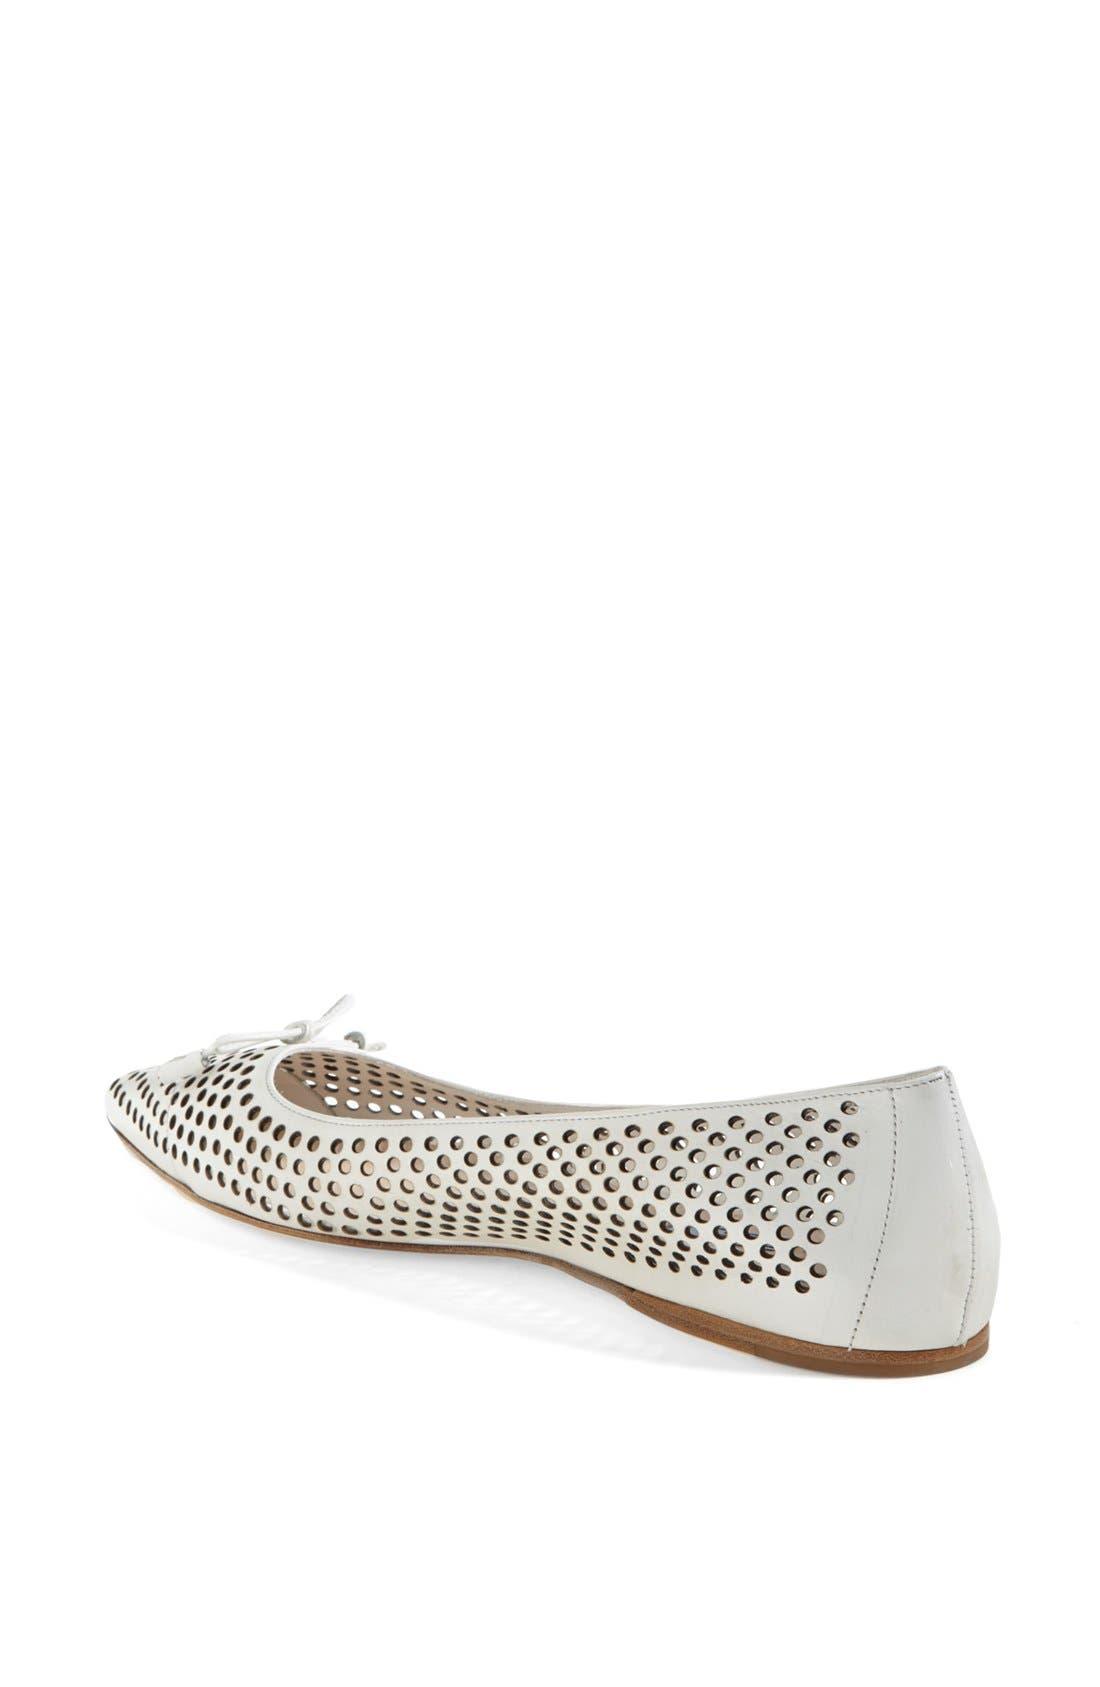 Alternate Image 2  - Prada Pointed Toe Perforated Ballet Flat